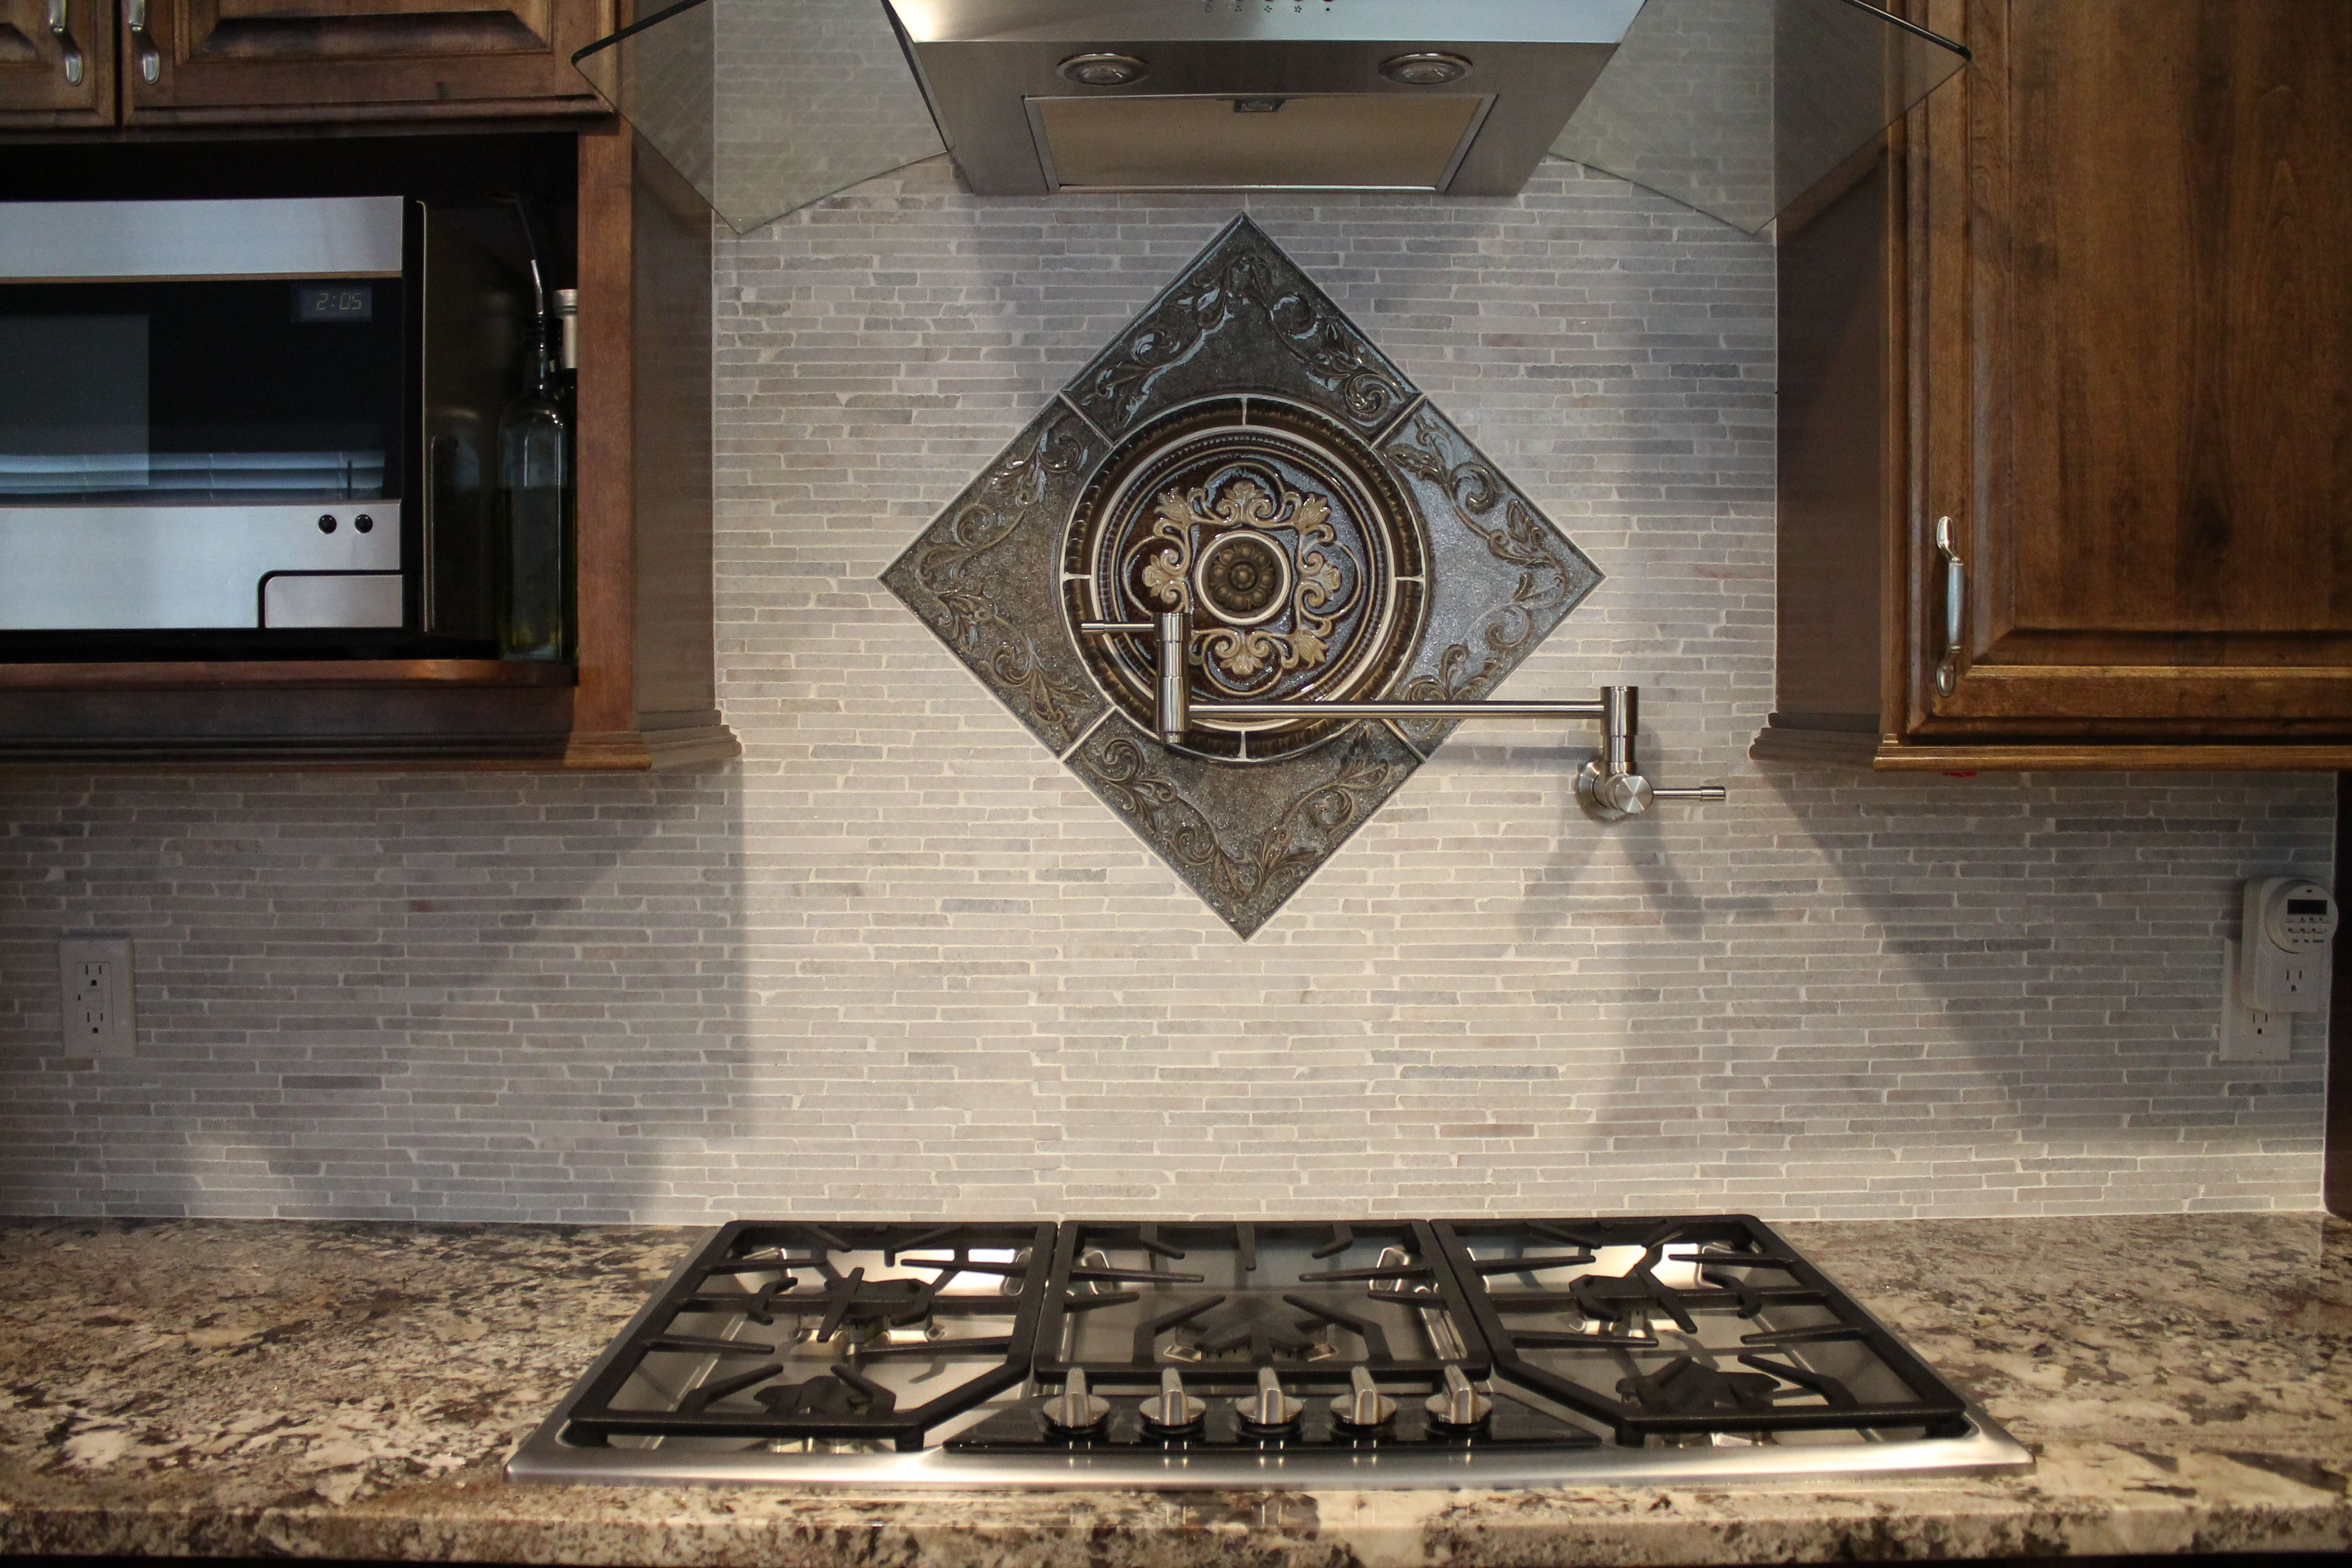 Kitchen Backsplash Design With Gray Brick Tile Mosaic